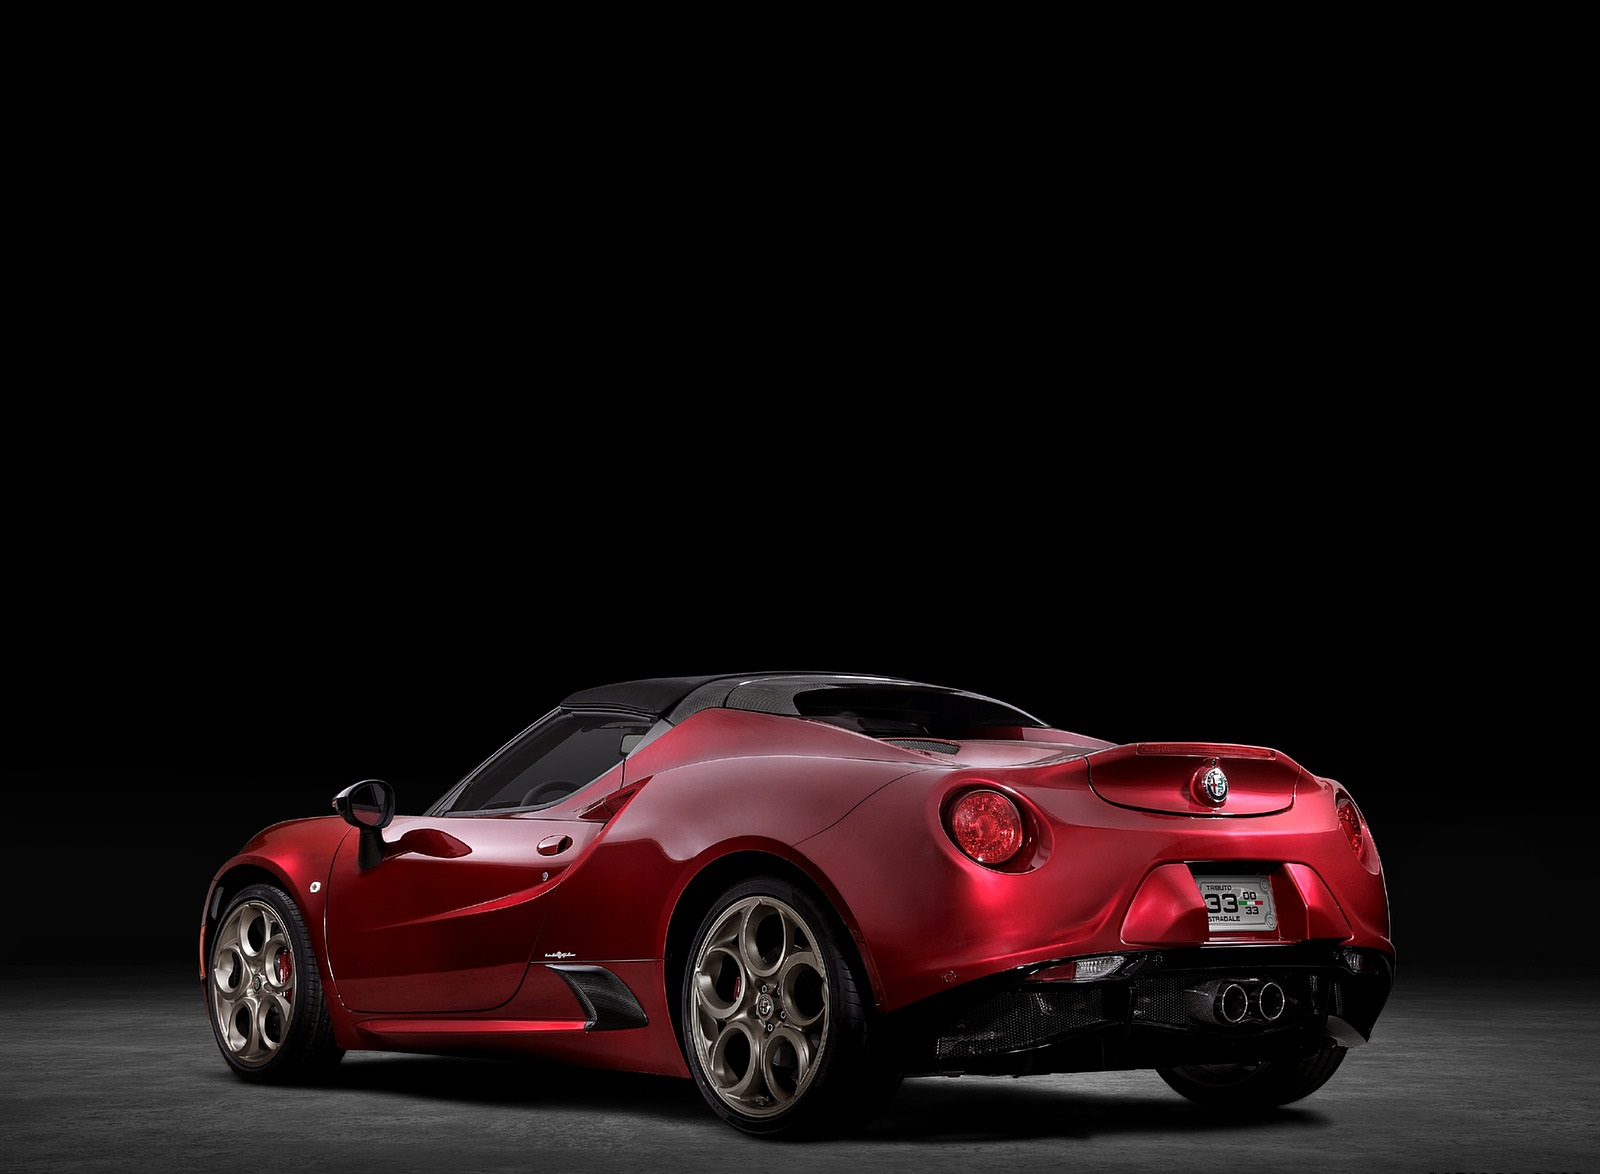 2020 Alfa Romeo 4C Spider 33 Stradale Tributo Rear Three-Quarter Wallpapers (6)